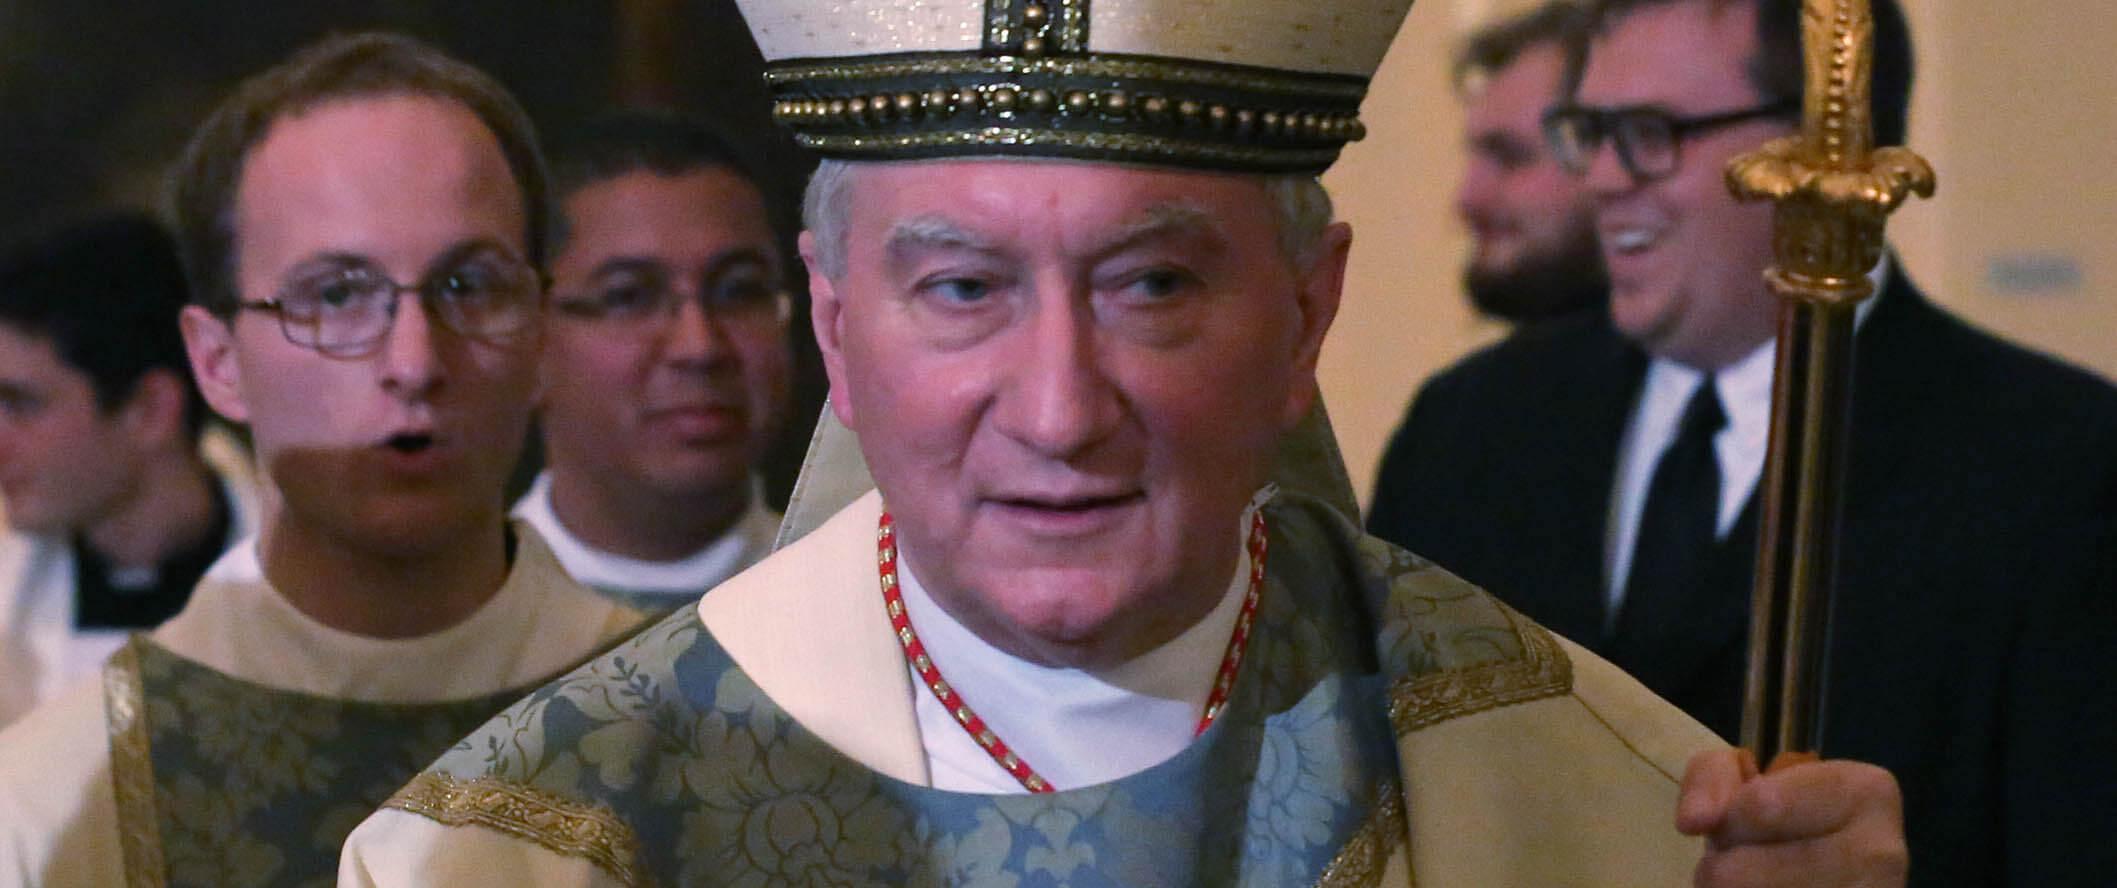 At Baltimore Mass Cardinal Parolin Praises Usccb For Century Of